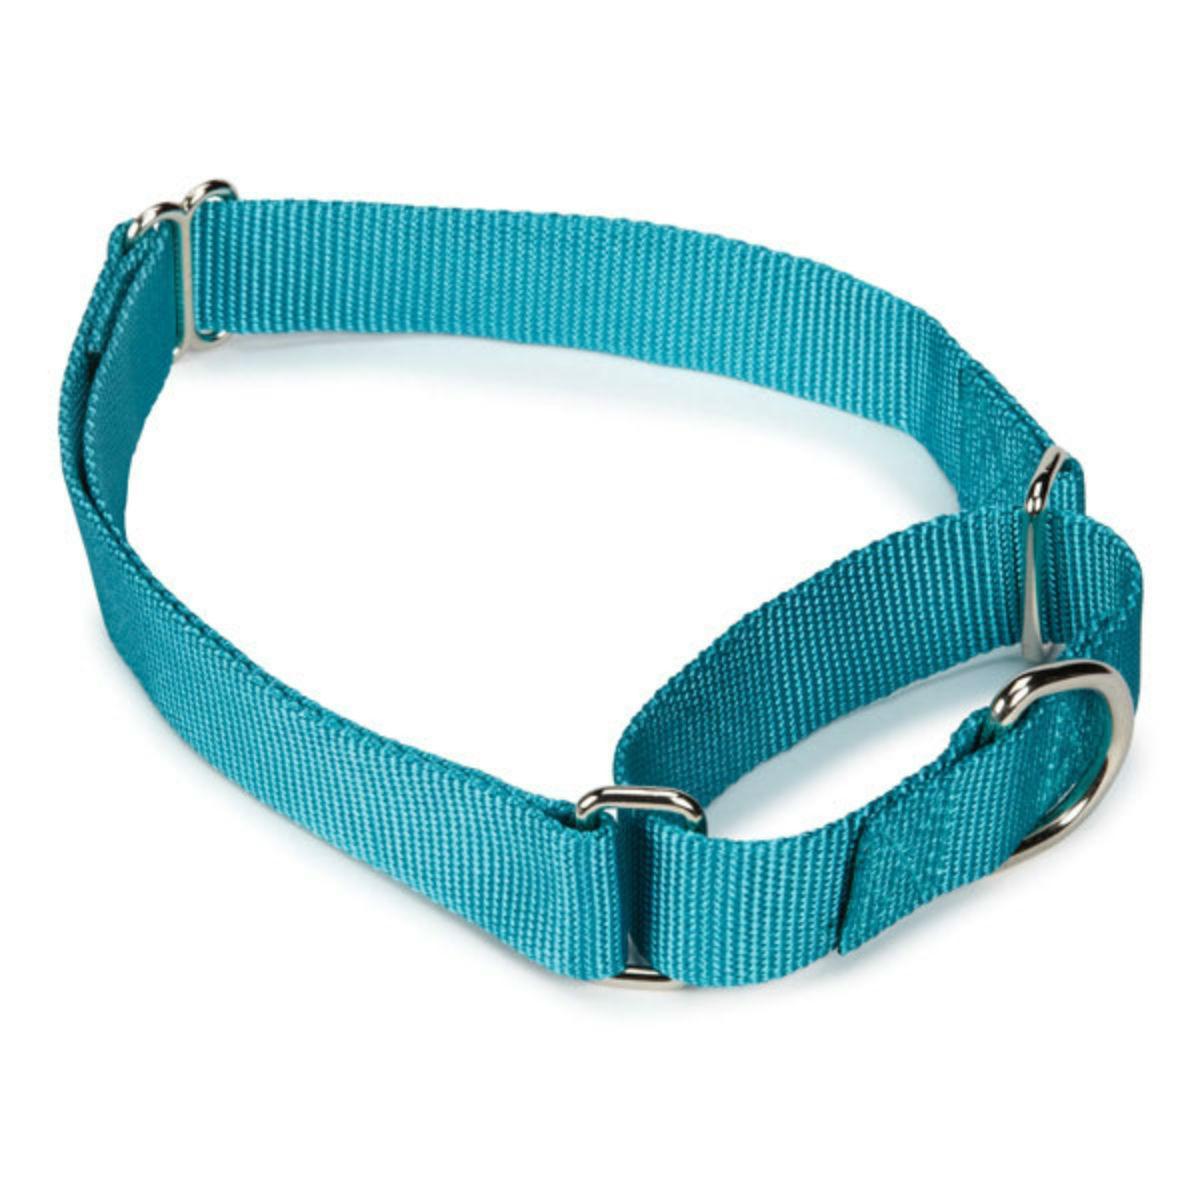 Guardian Gear Nylon Martingale Dog Collar - Bluebird